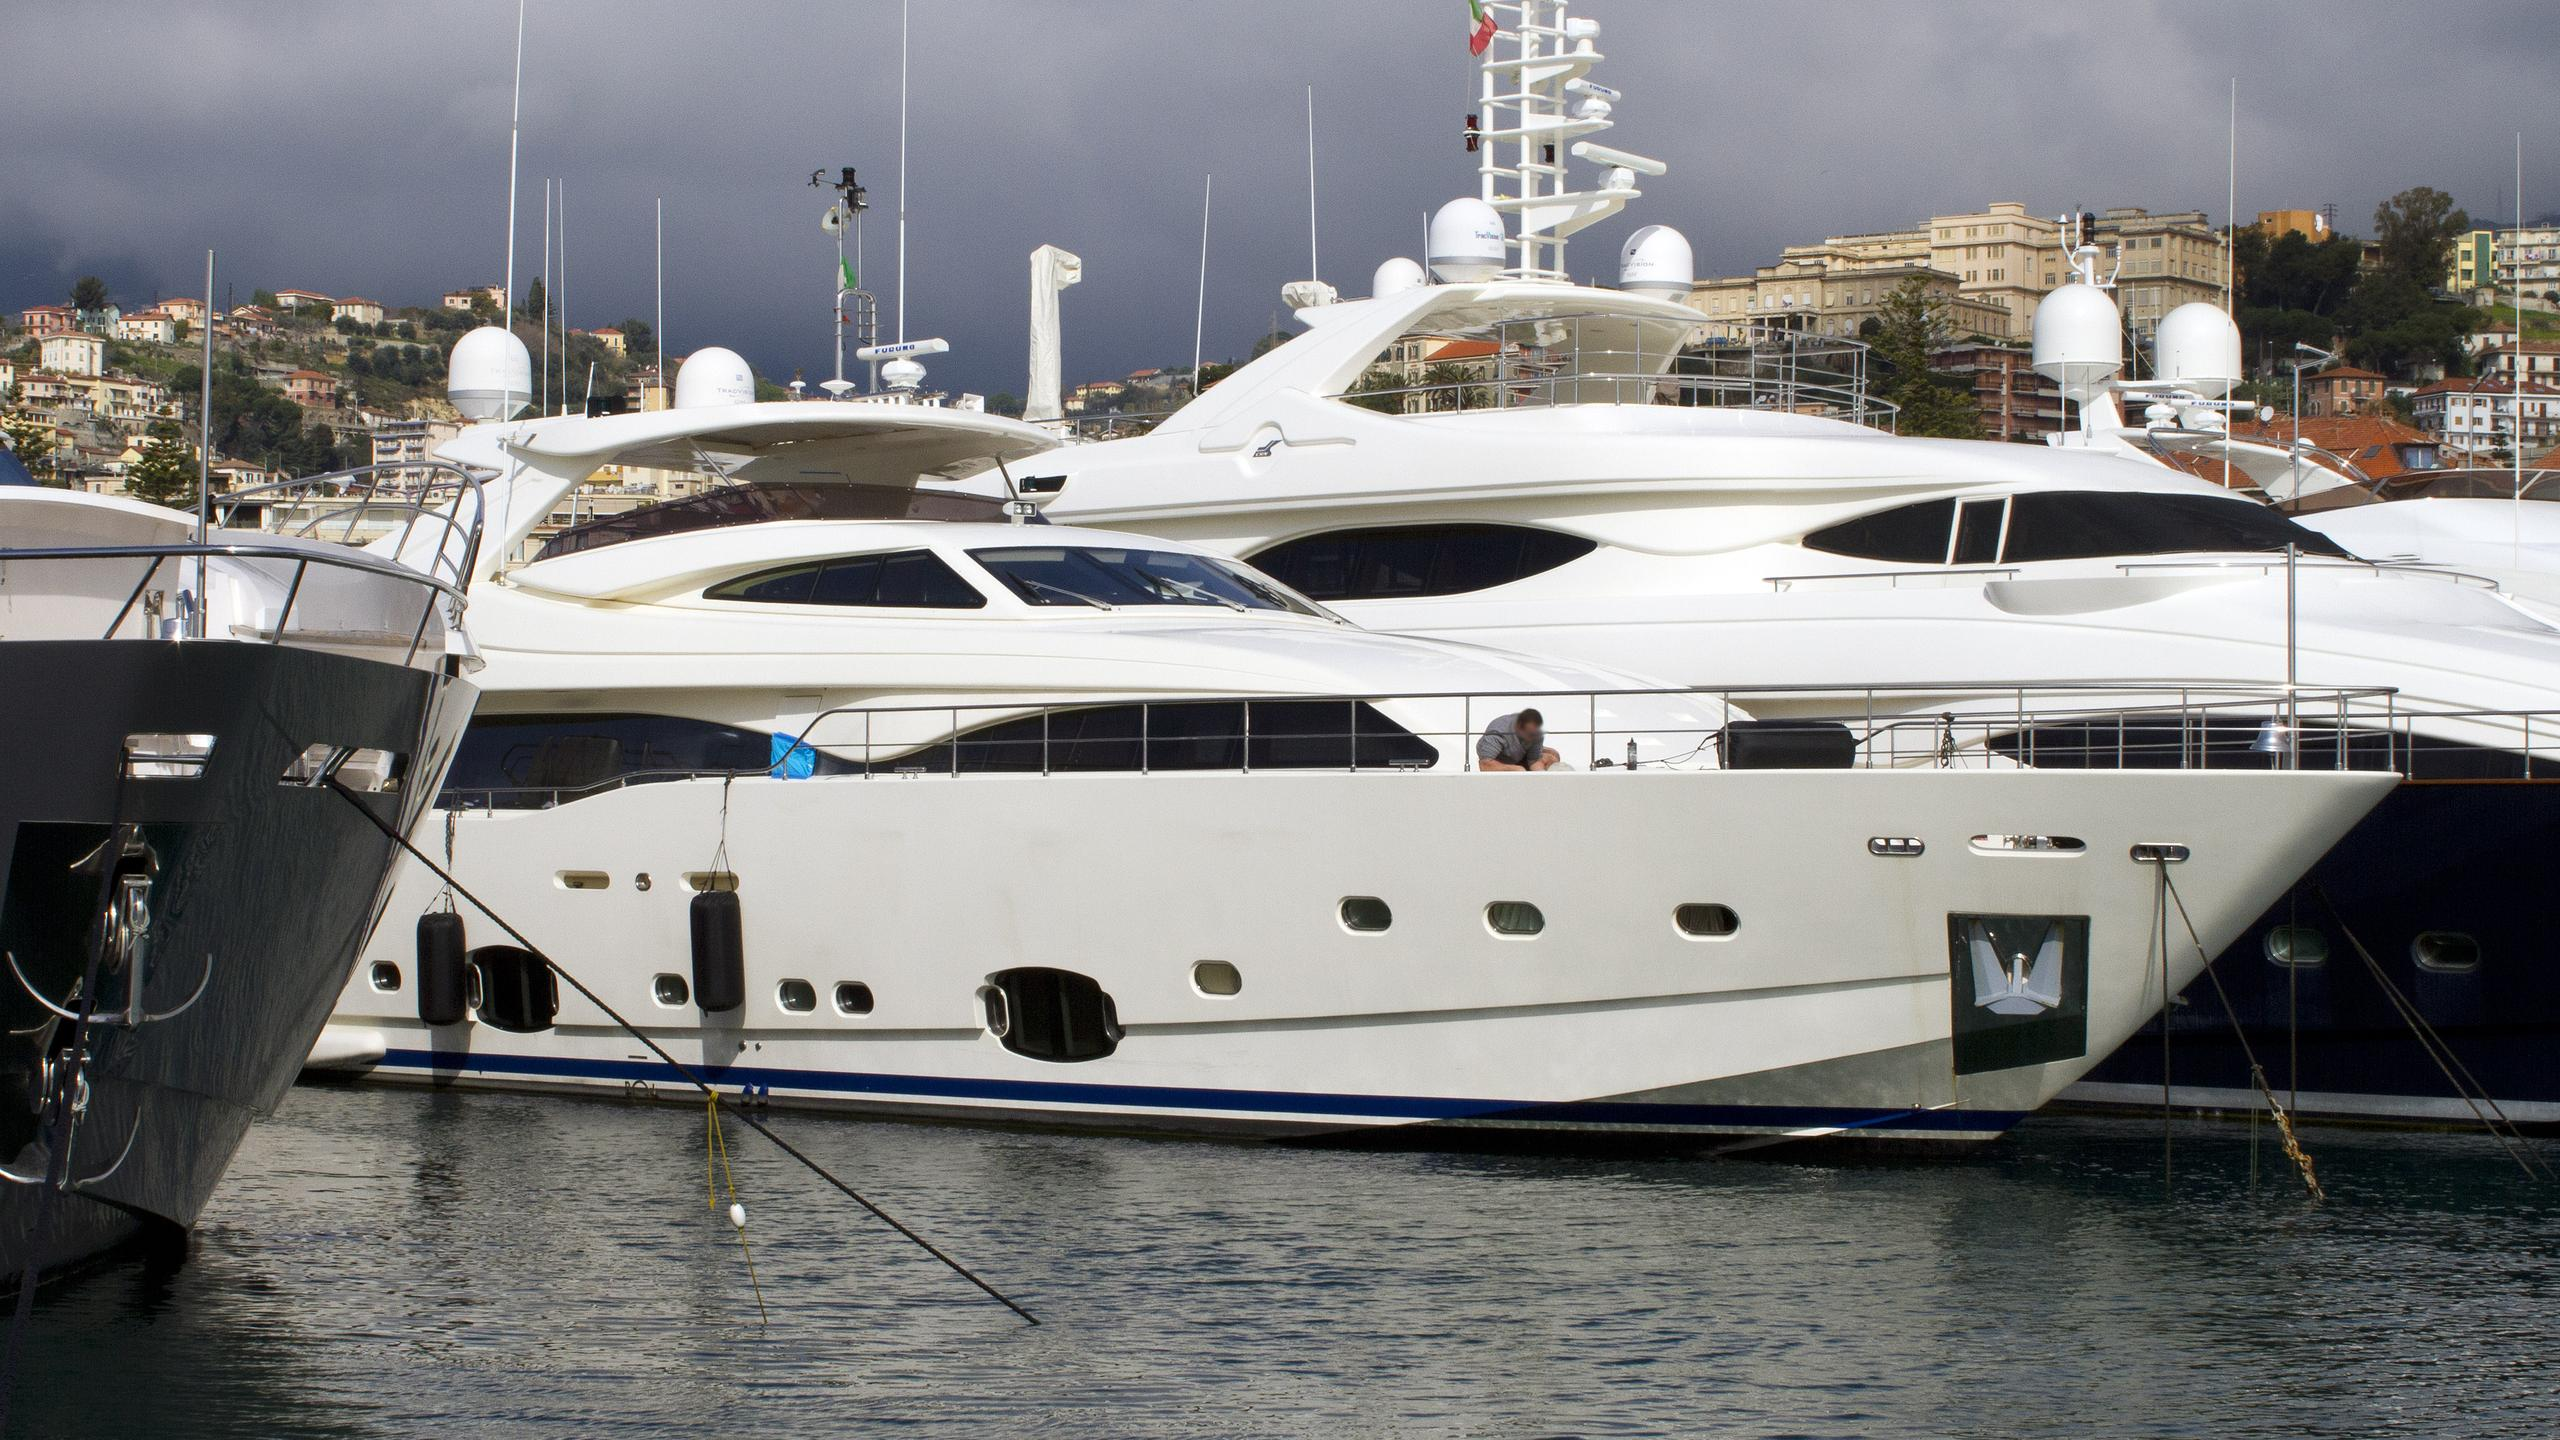 robusto-motor-yacht-ferretti-custom-line-2009-34m-moored